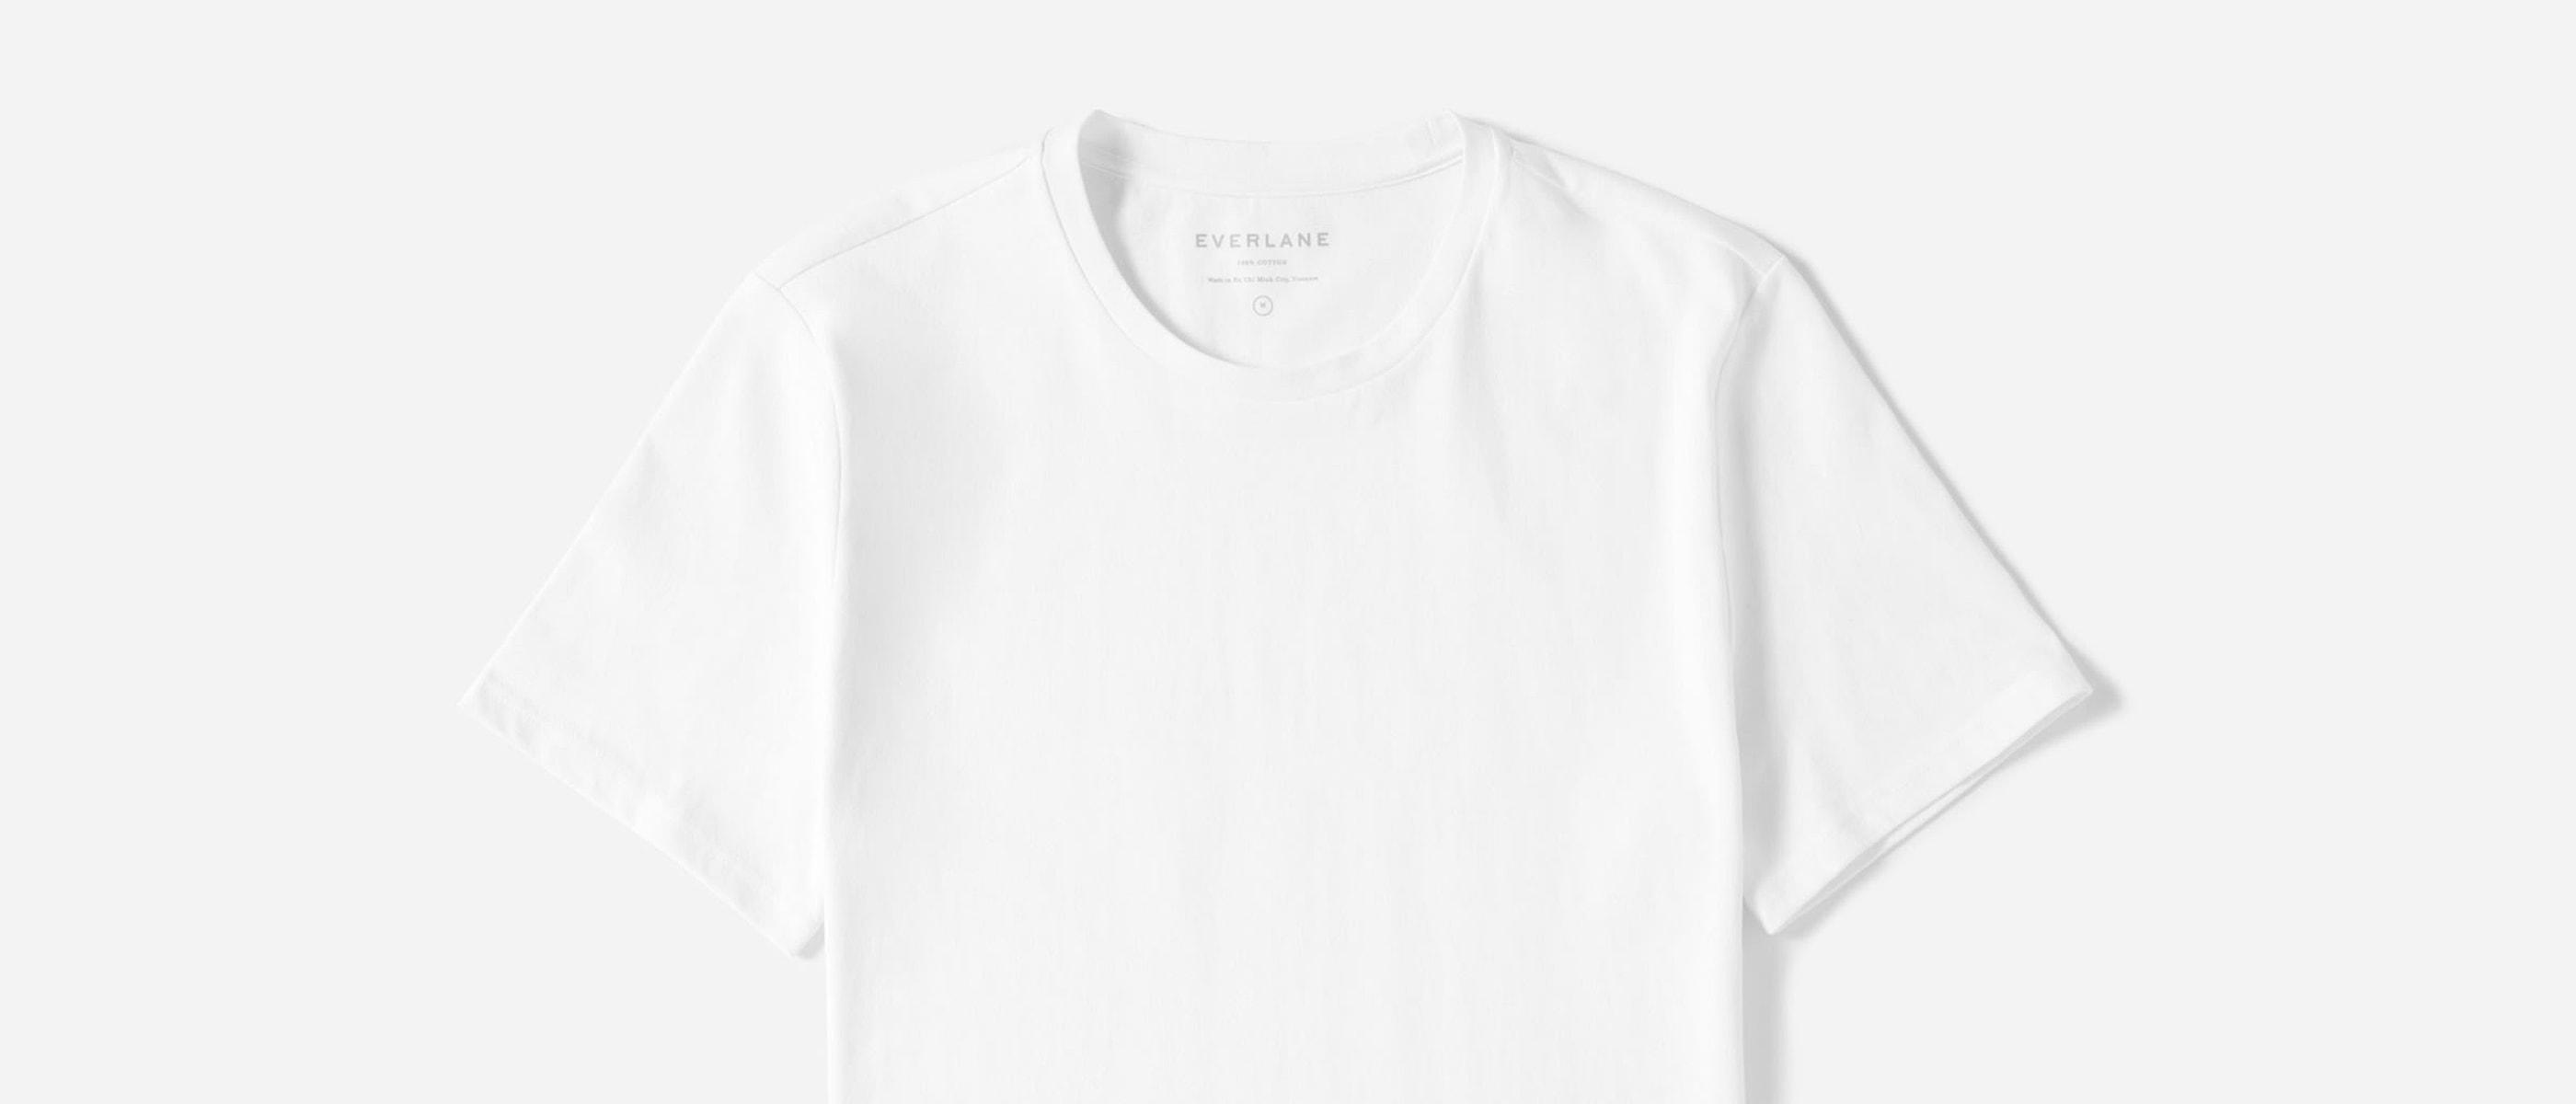 The Everlane Brand Tee Shirt